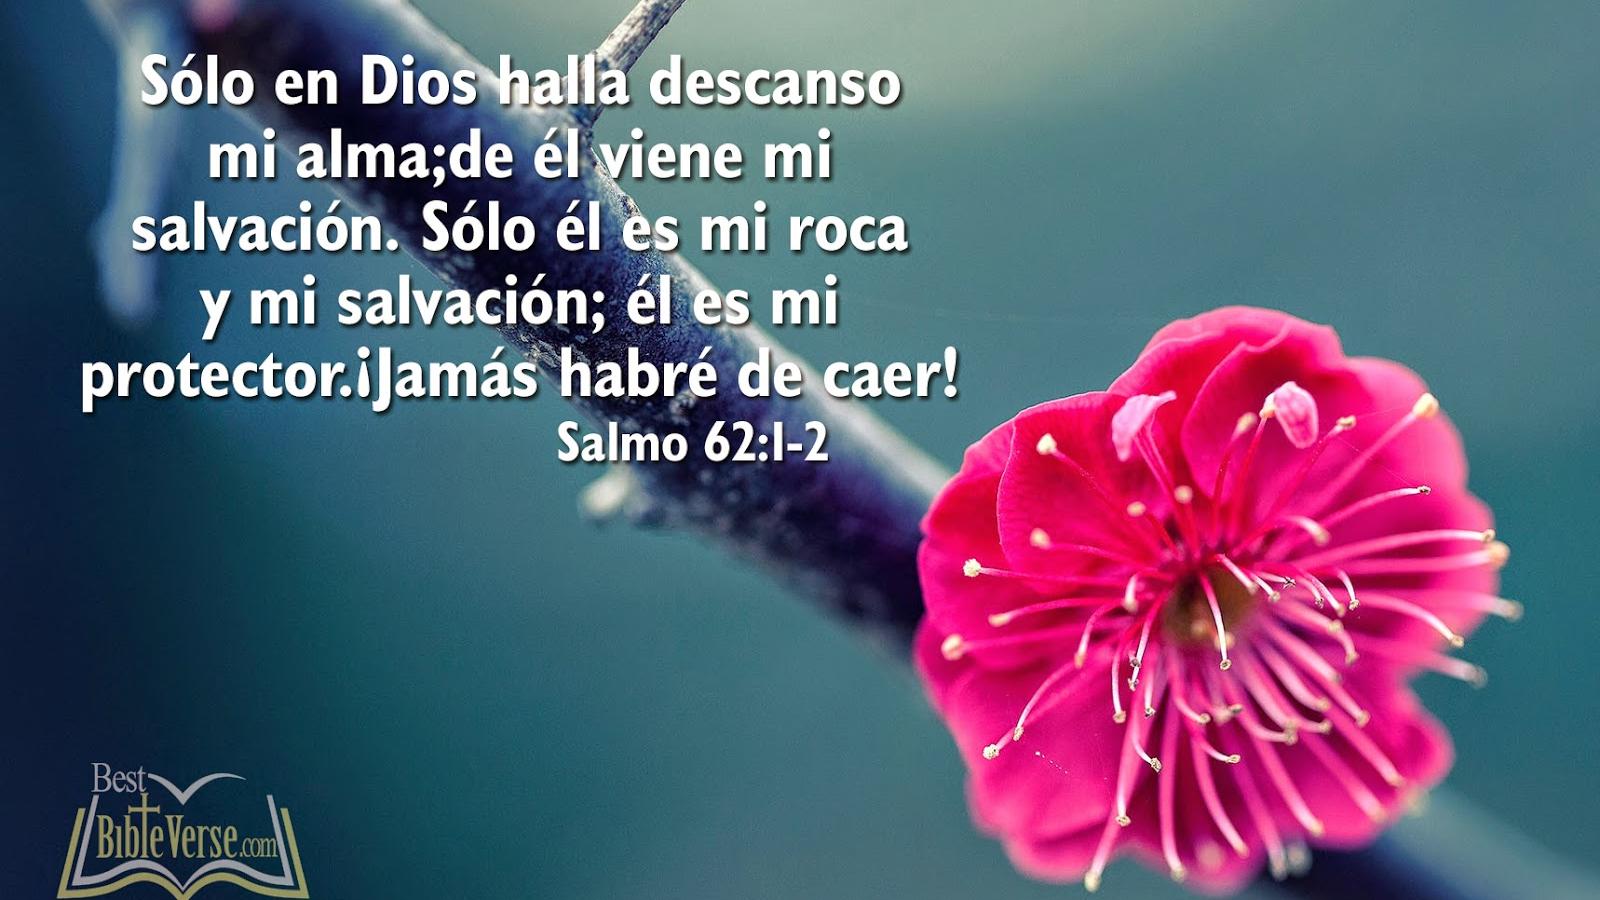 spanish bible verse wallpapers nice